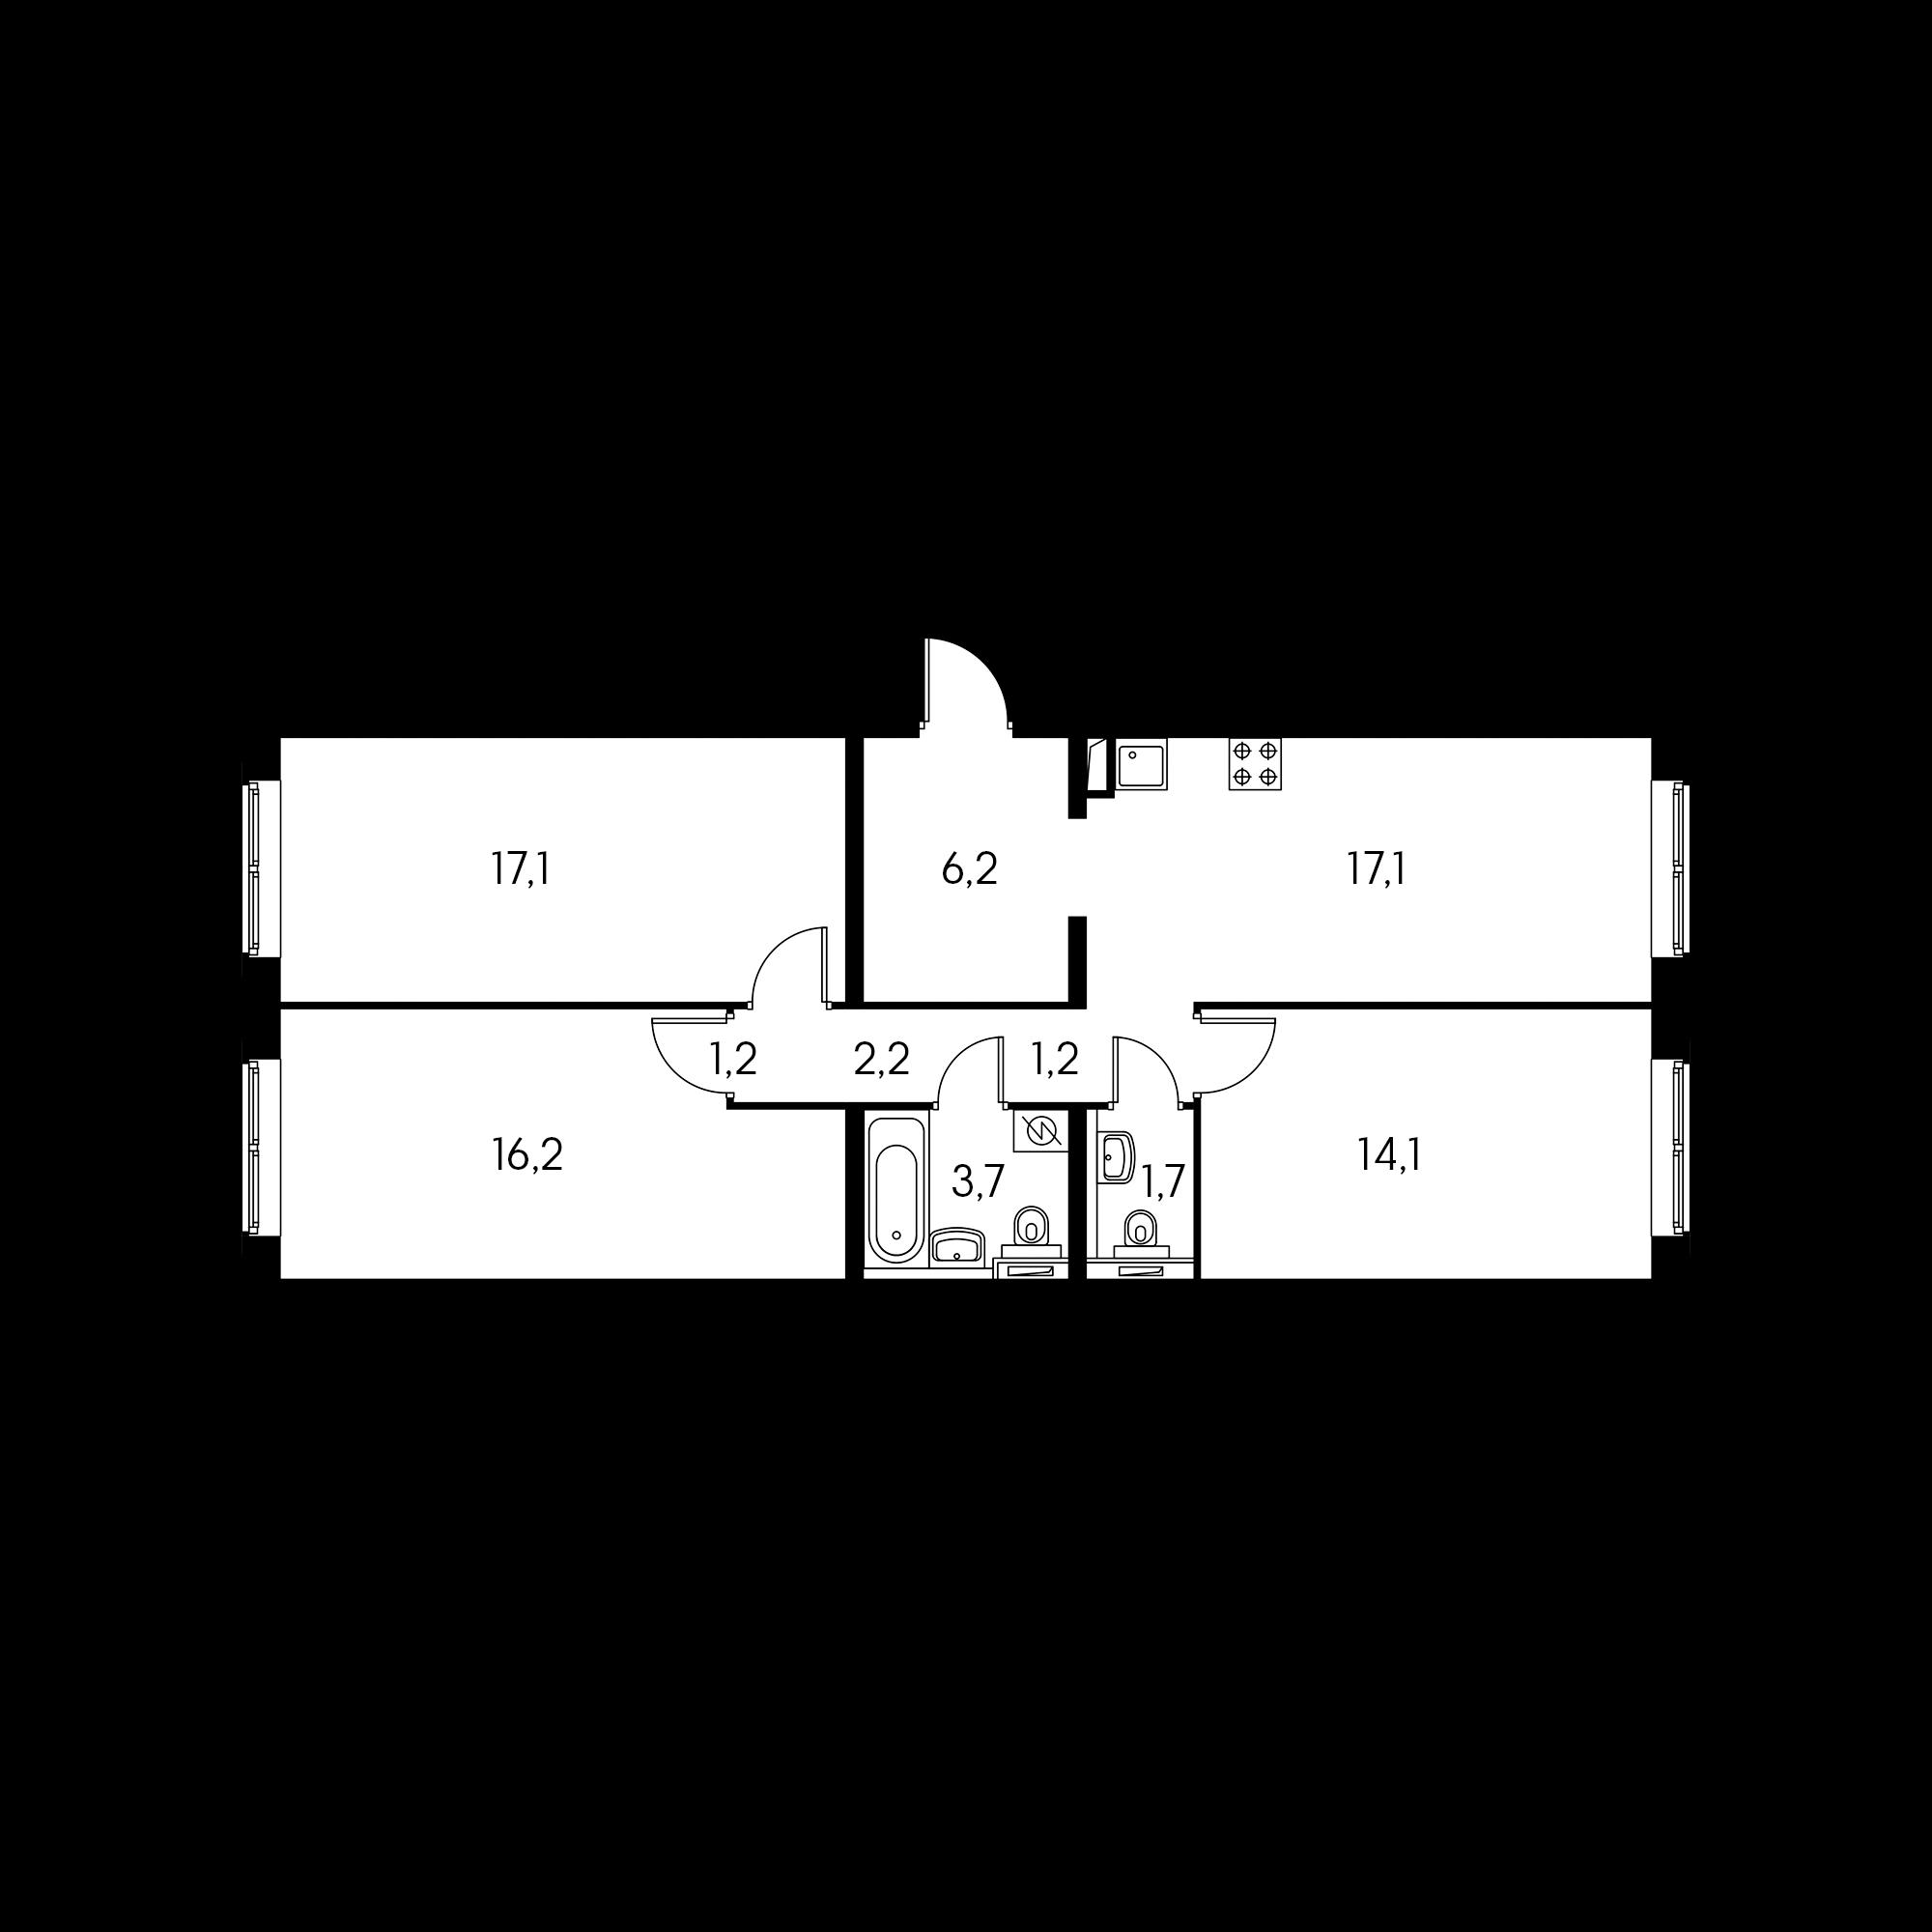 3KM16_6.0-1_S_Z_1